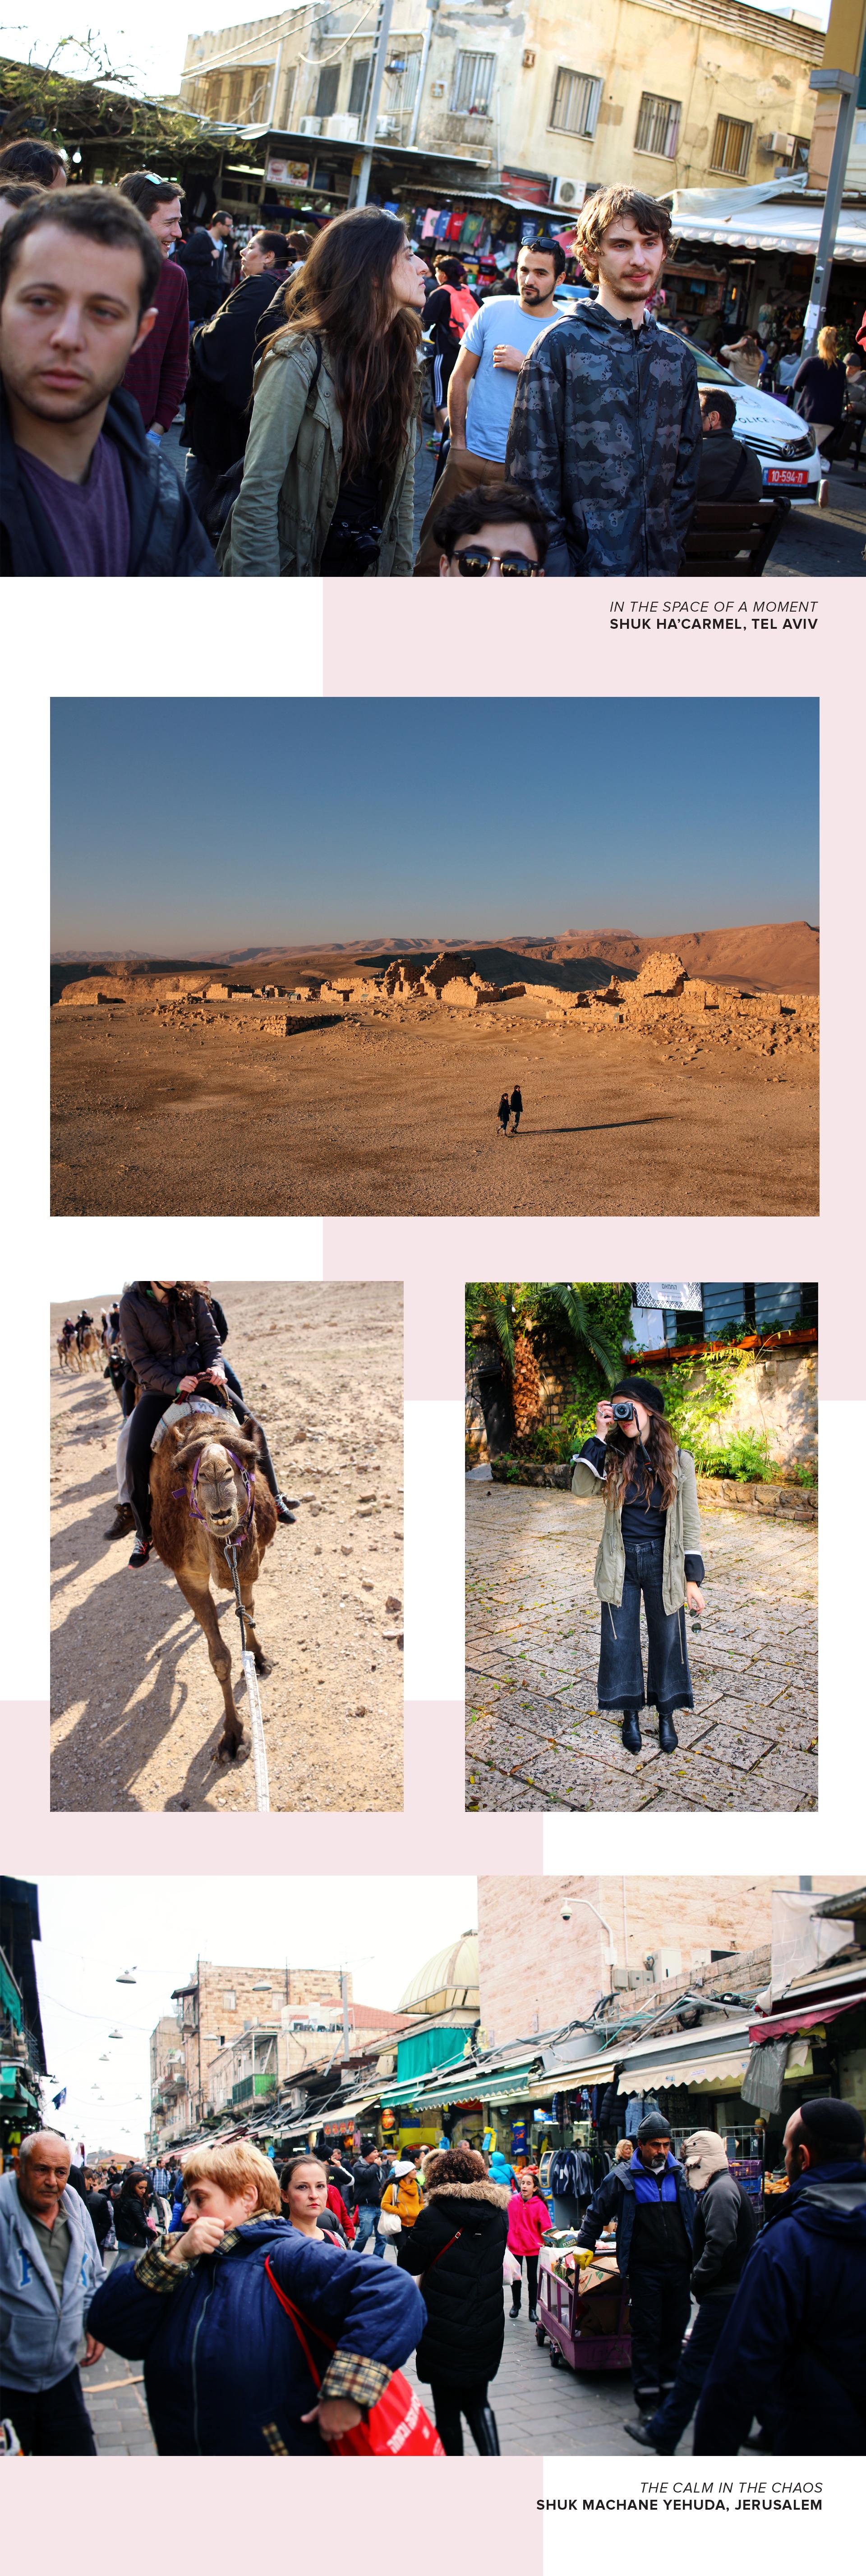 Travel photography by Geena Matuson @geenamatuson #thegirlmirage featuring Israel, with art book to follow. See more @ https://thegirlmirage.com.